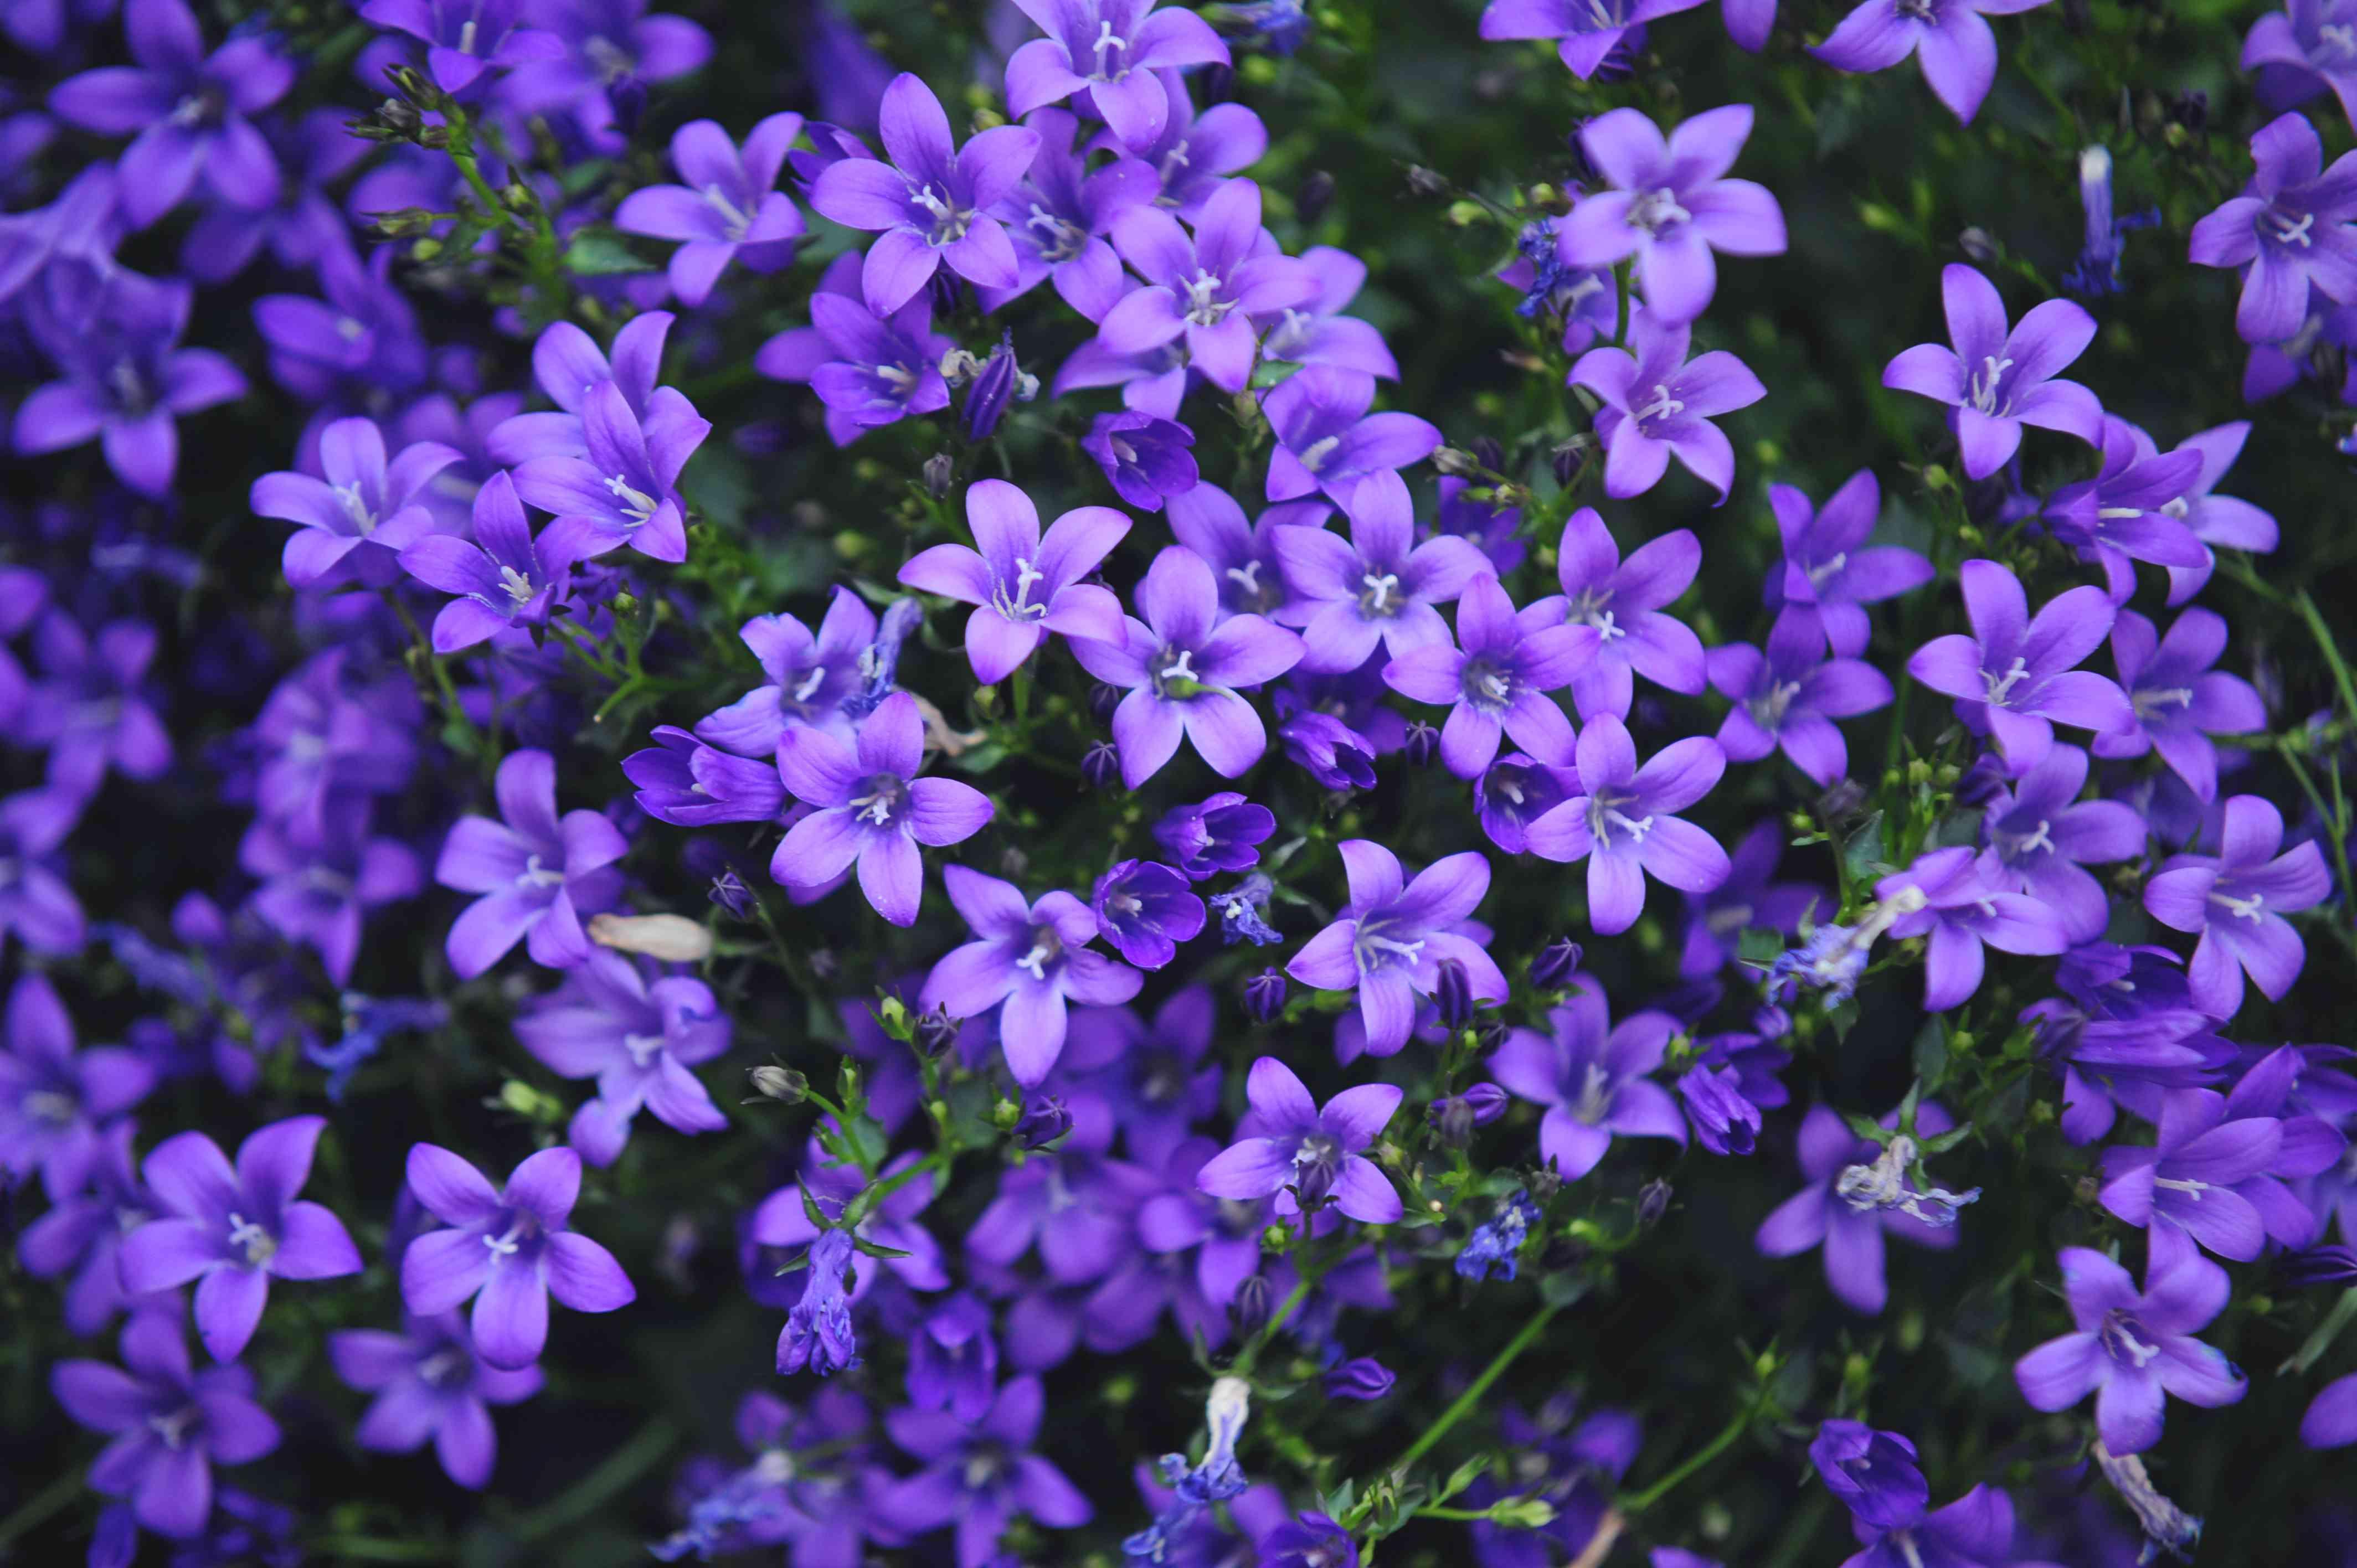 'Bavaria blue' campanula flowers with lavender star-shaped petals